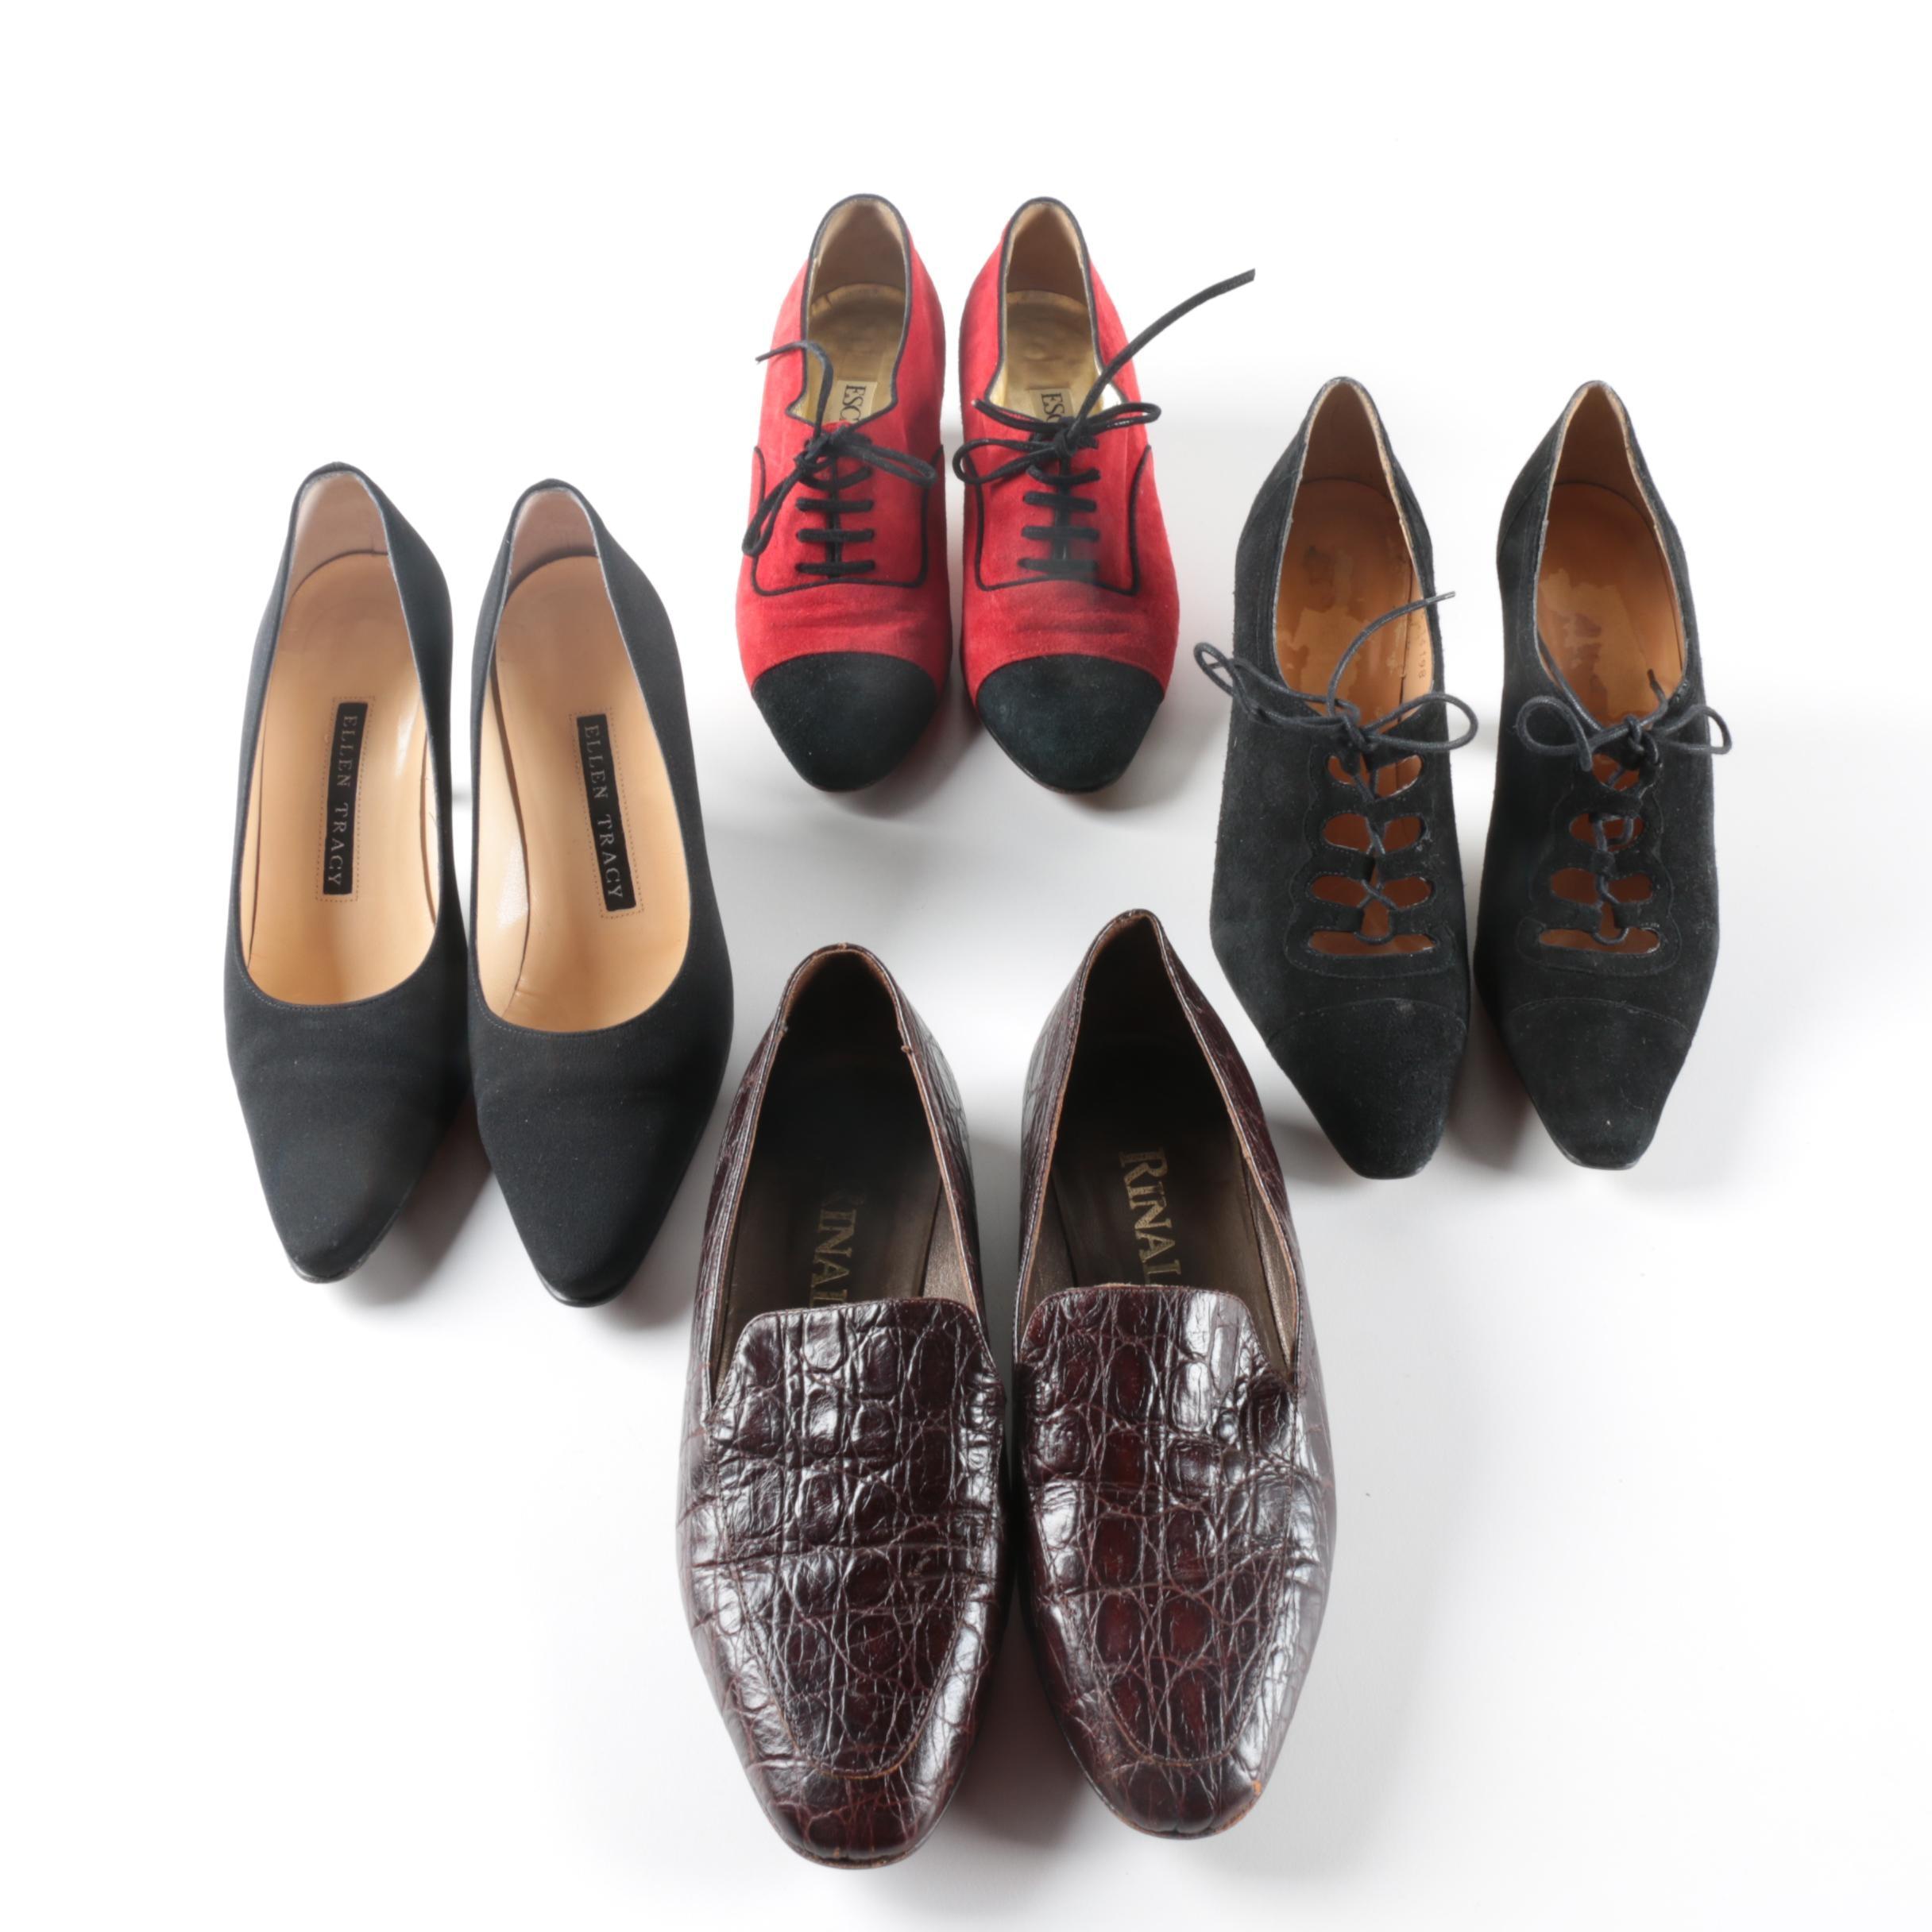 Assortment of Women's Shoes